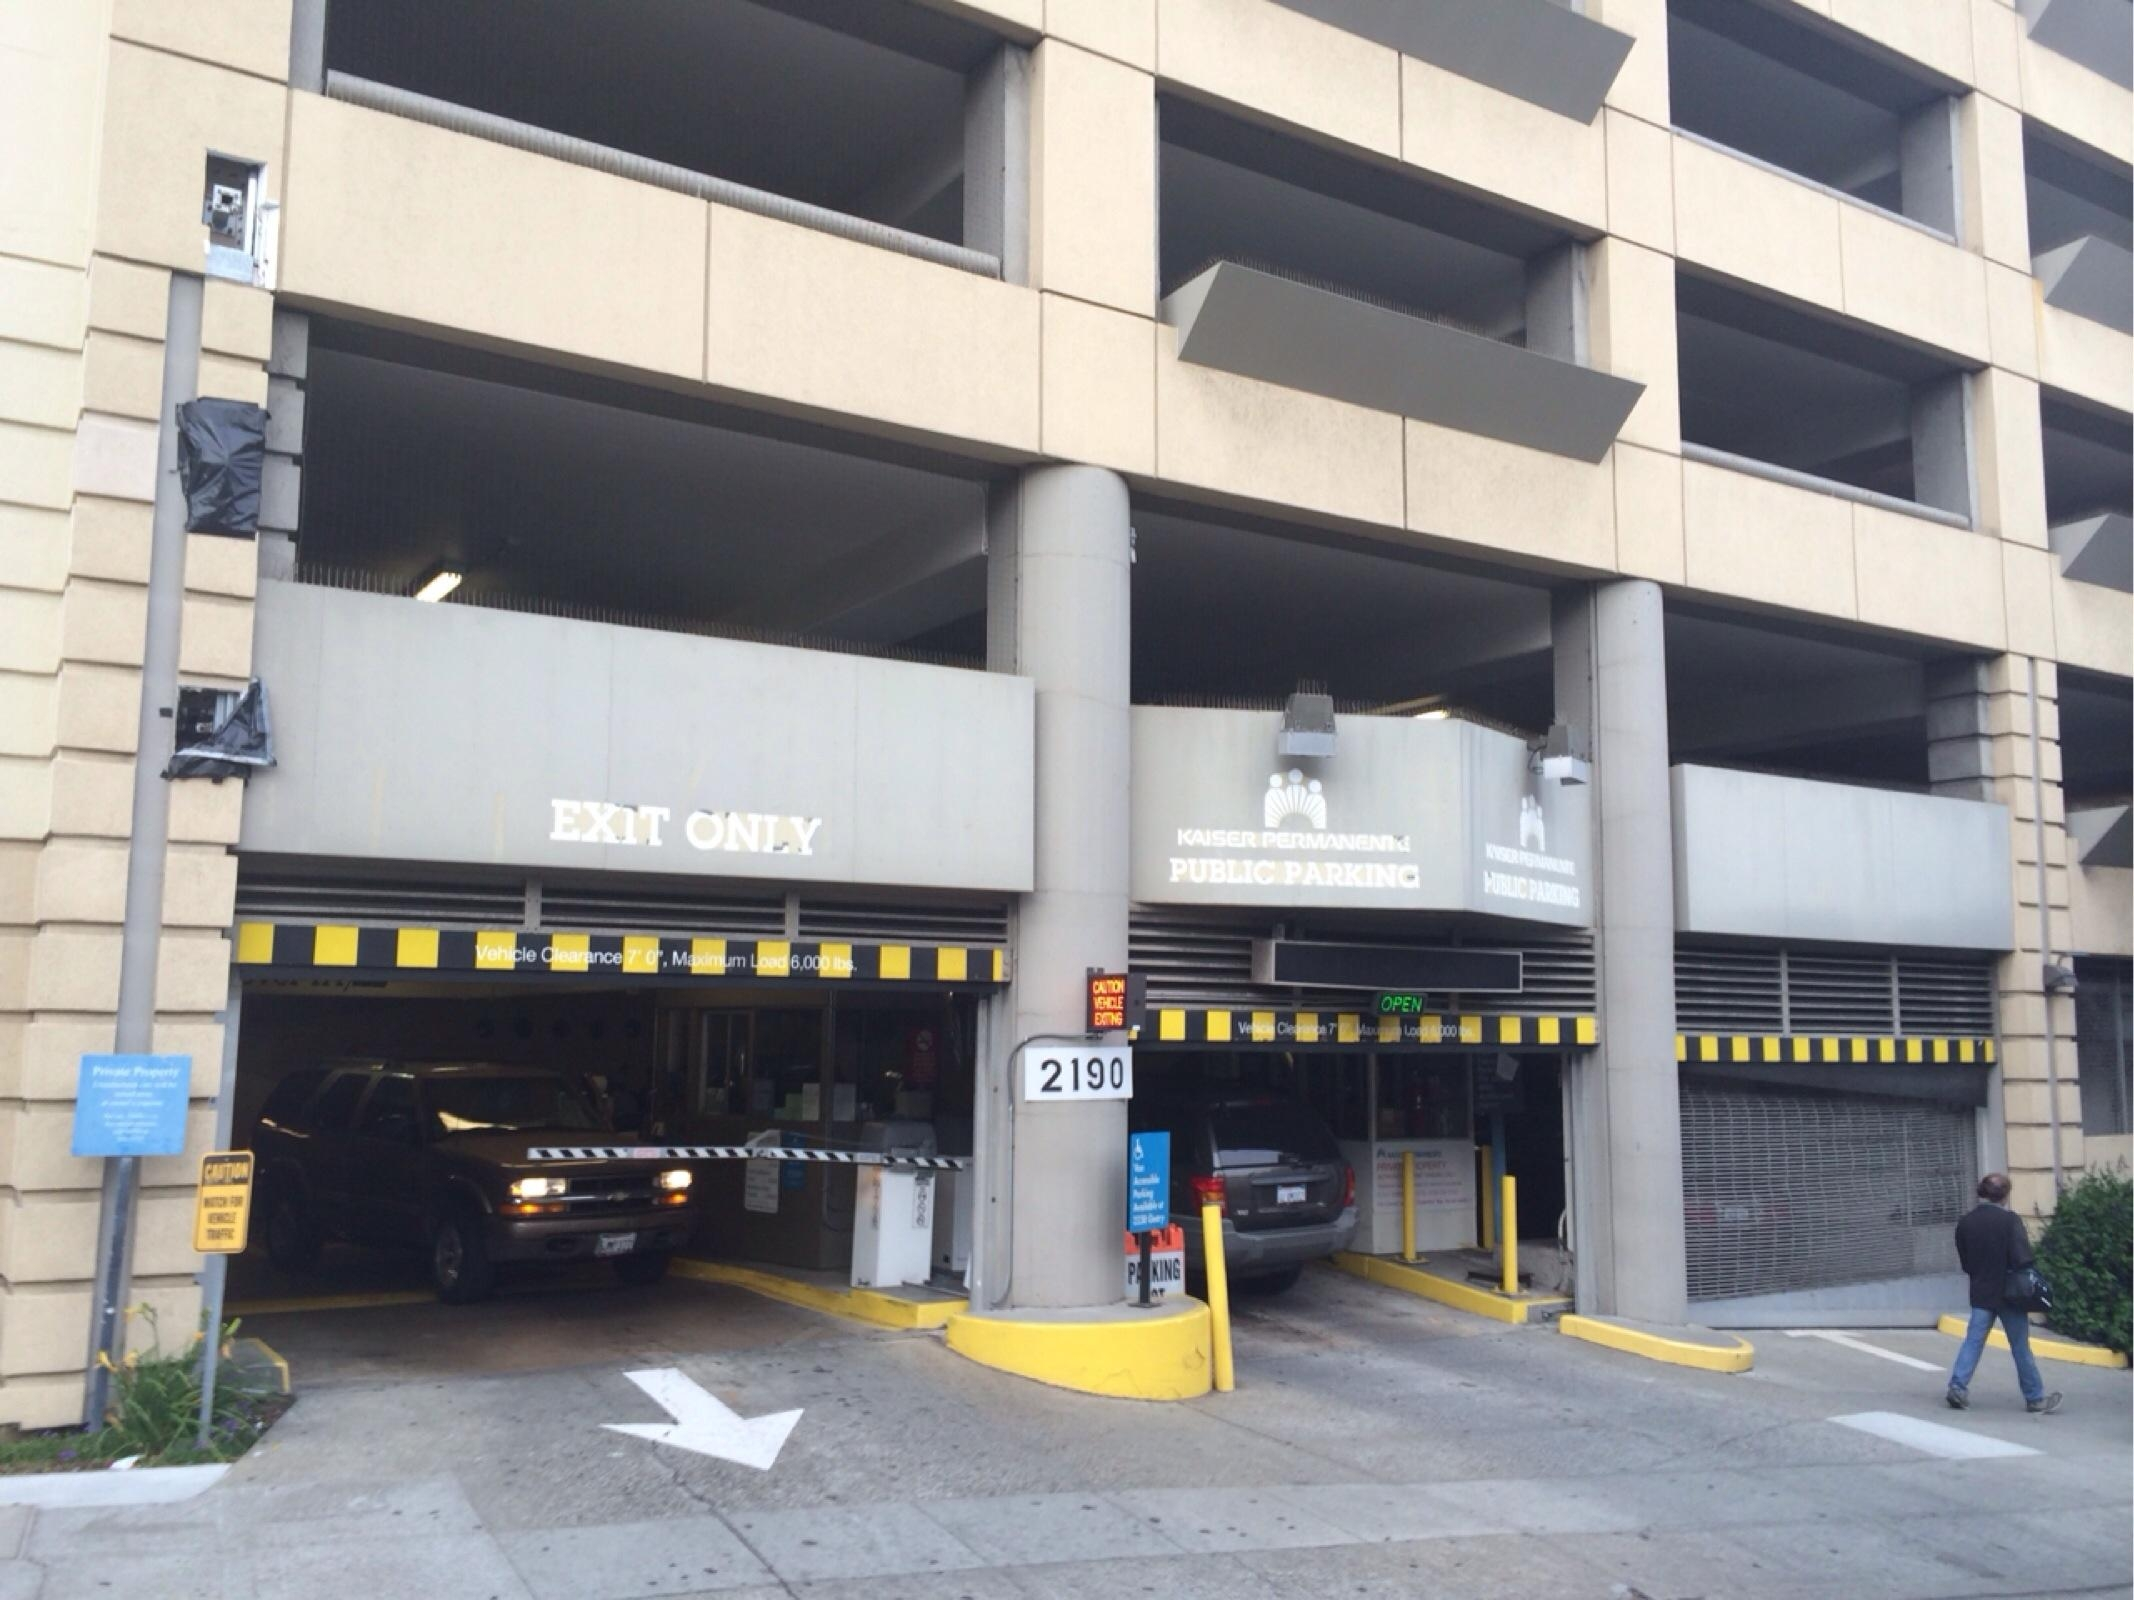 2190 OFarrell St Garage  Parking in San Francisco  ParkMe